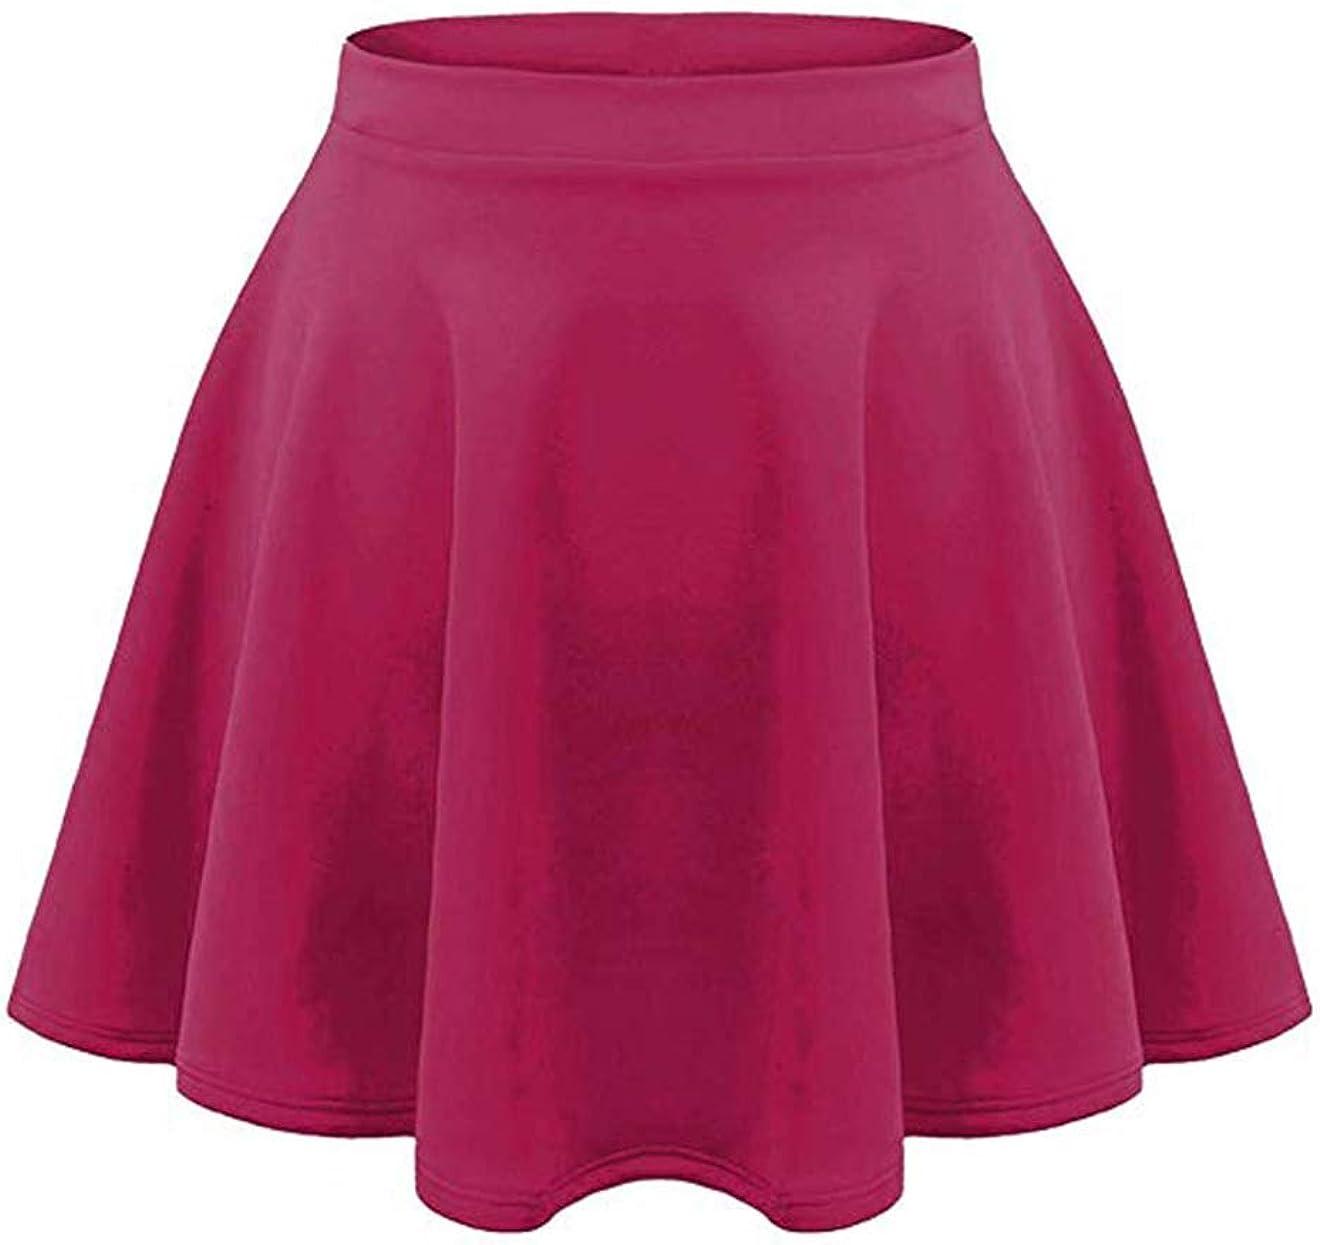 Loxdonz Girls Kids Casual Mini Stretch Waist Flared Plain Pleated Skater Skirt